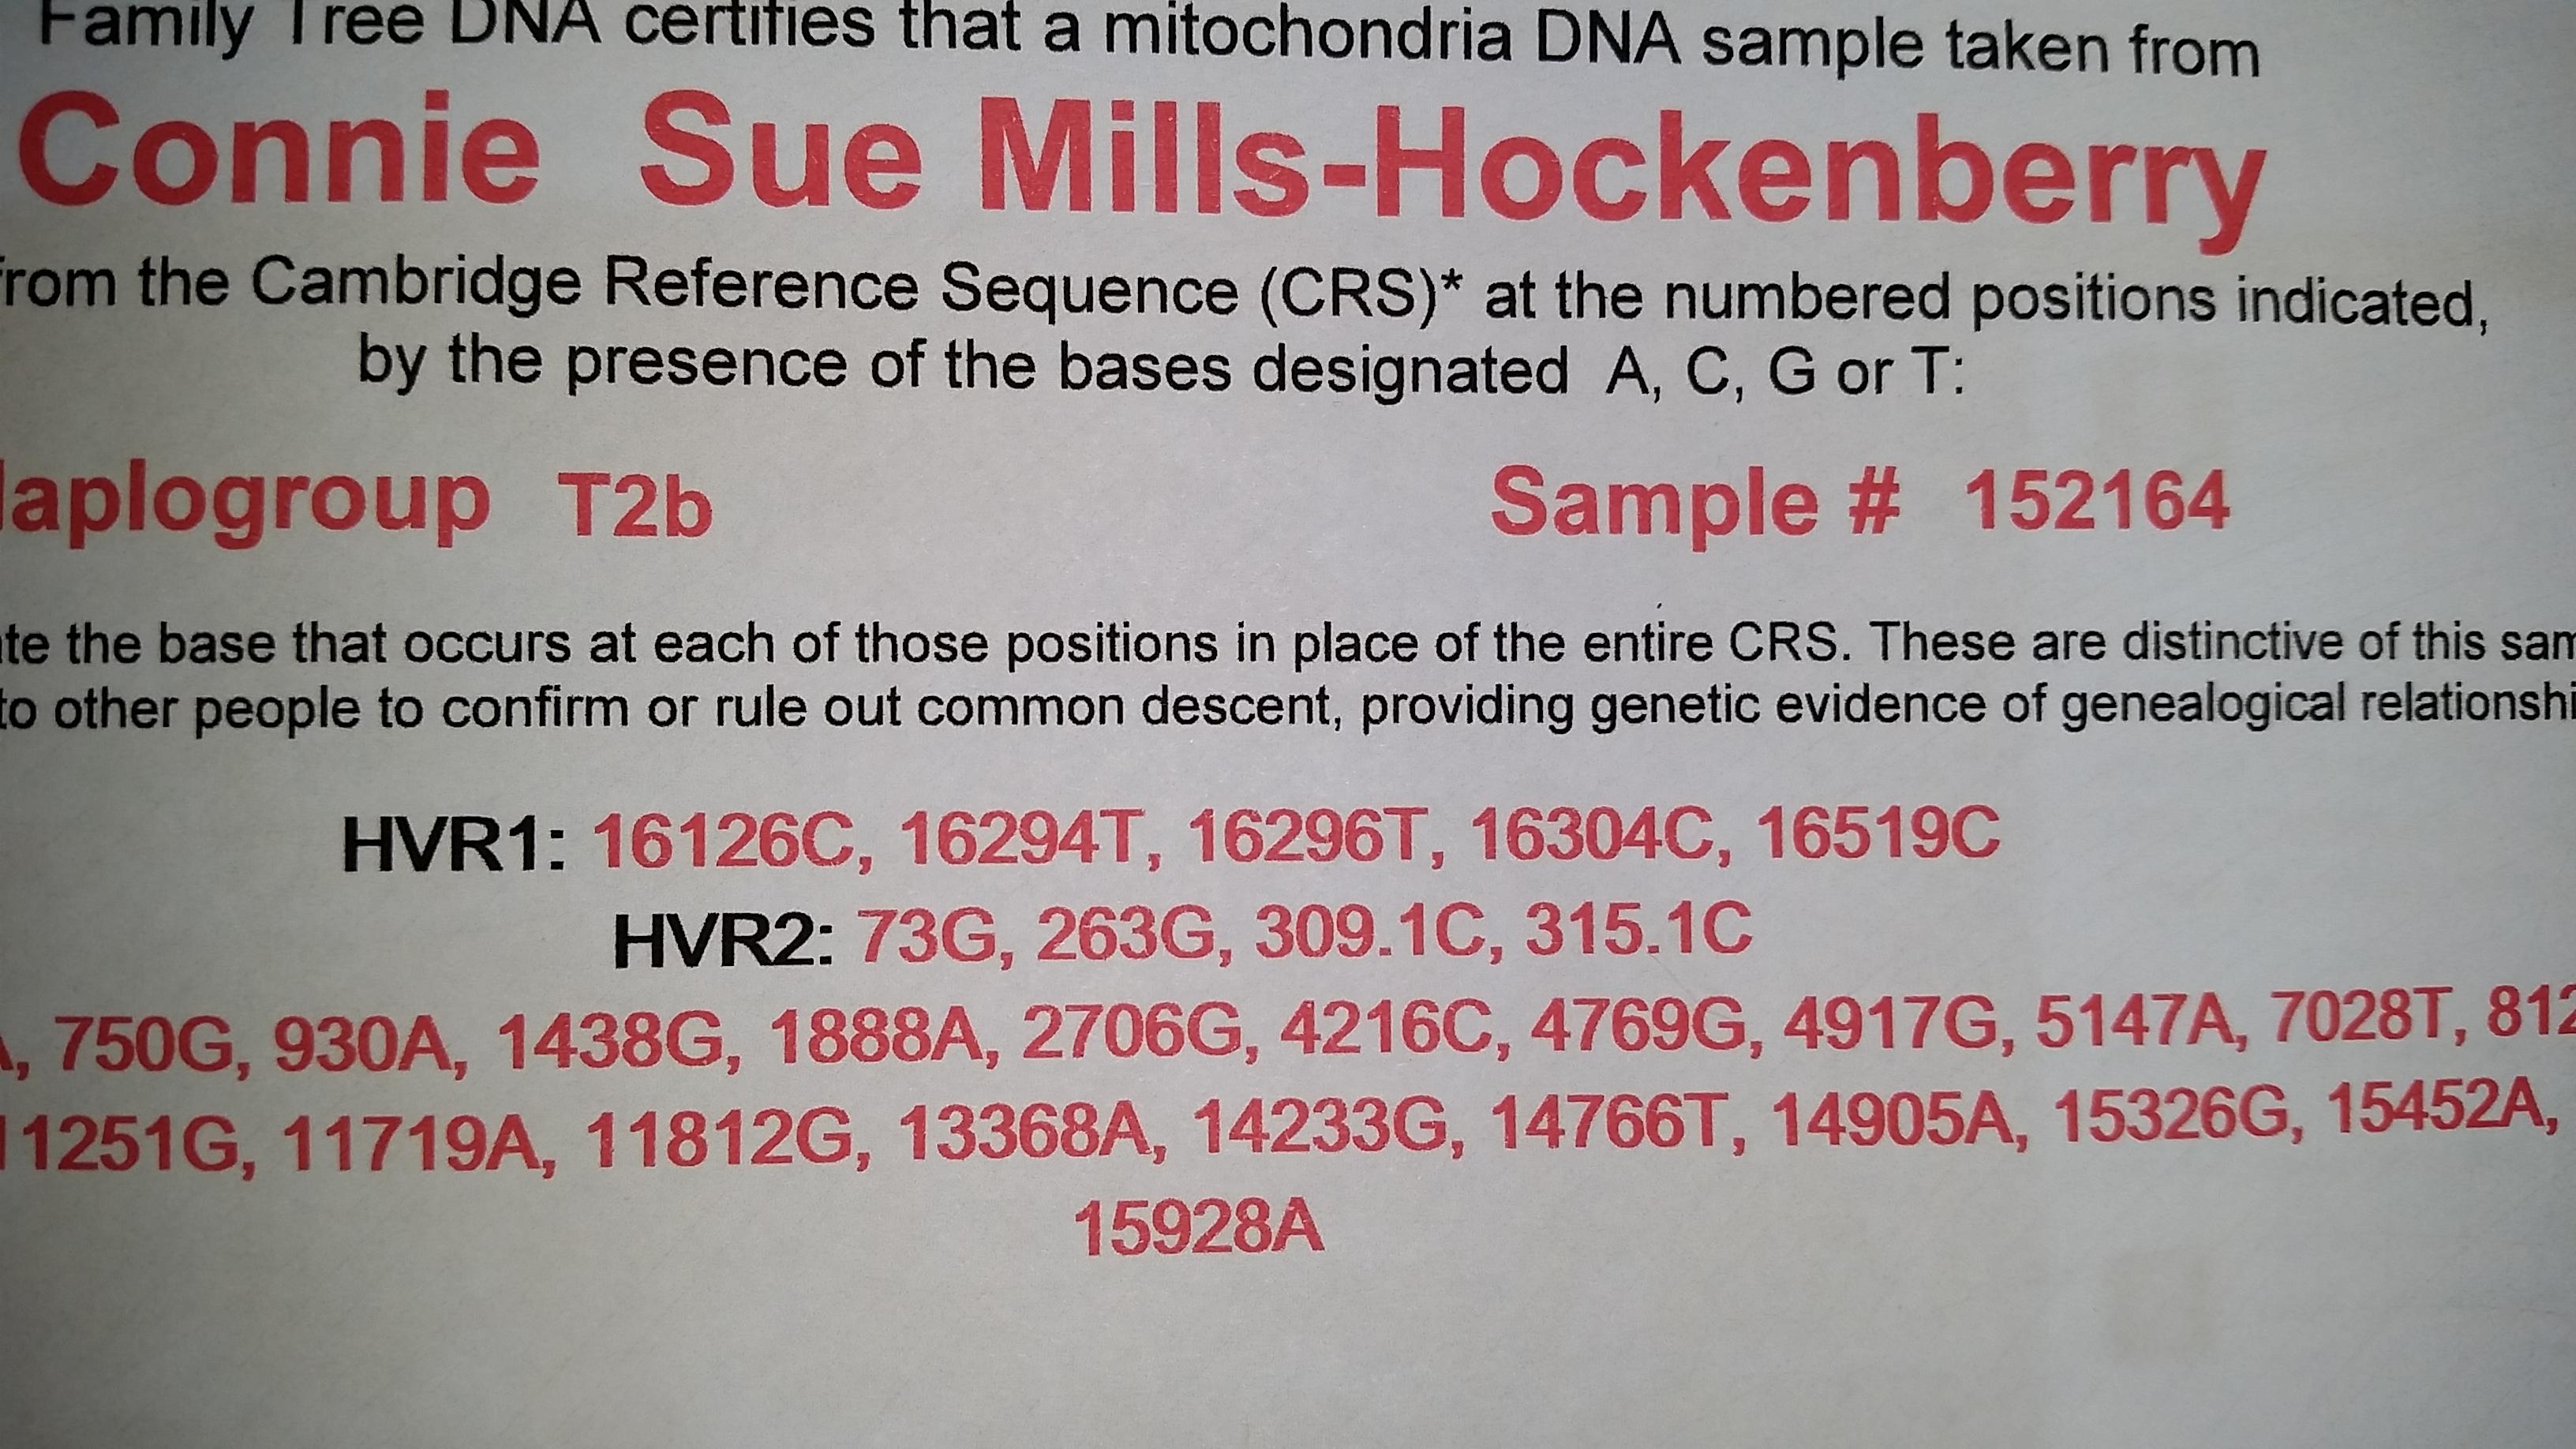 haplogroup T2b